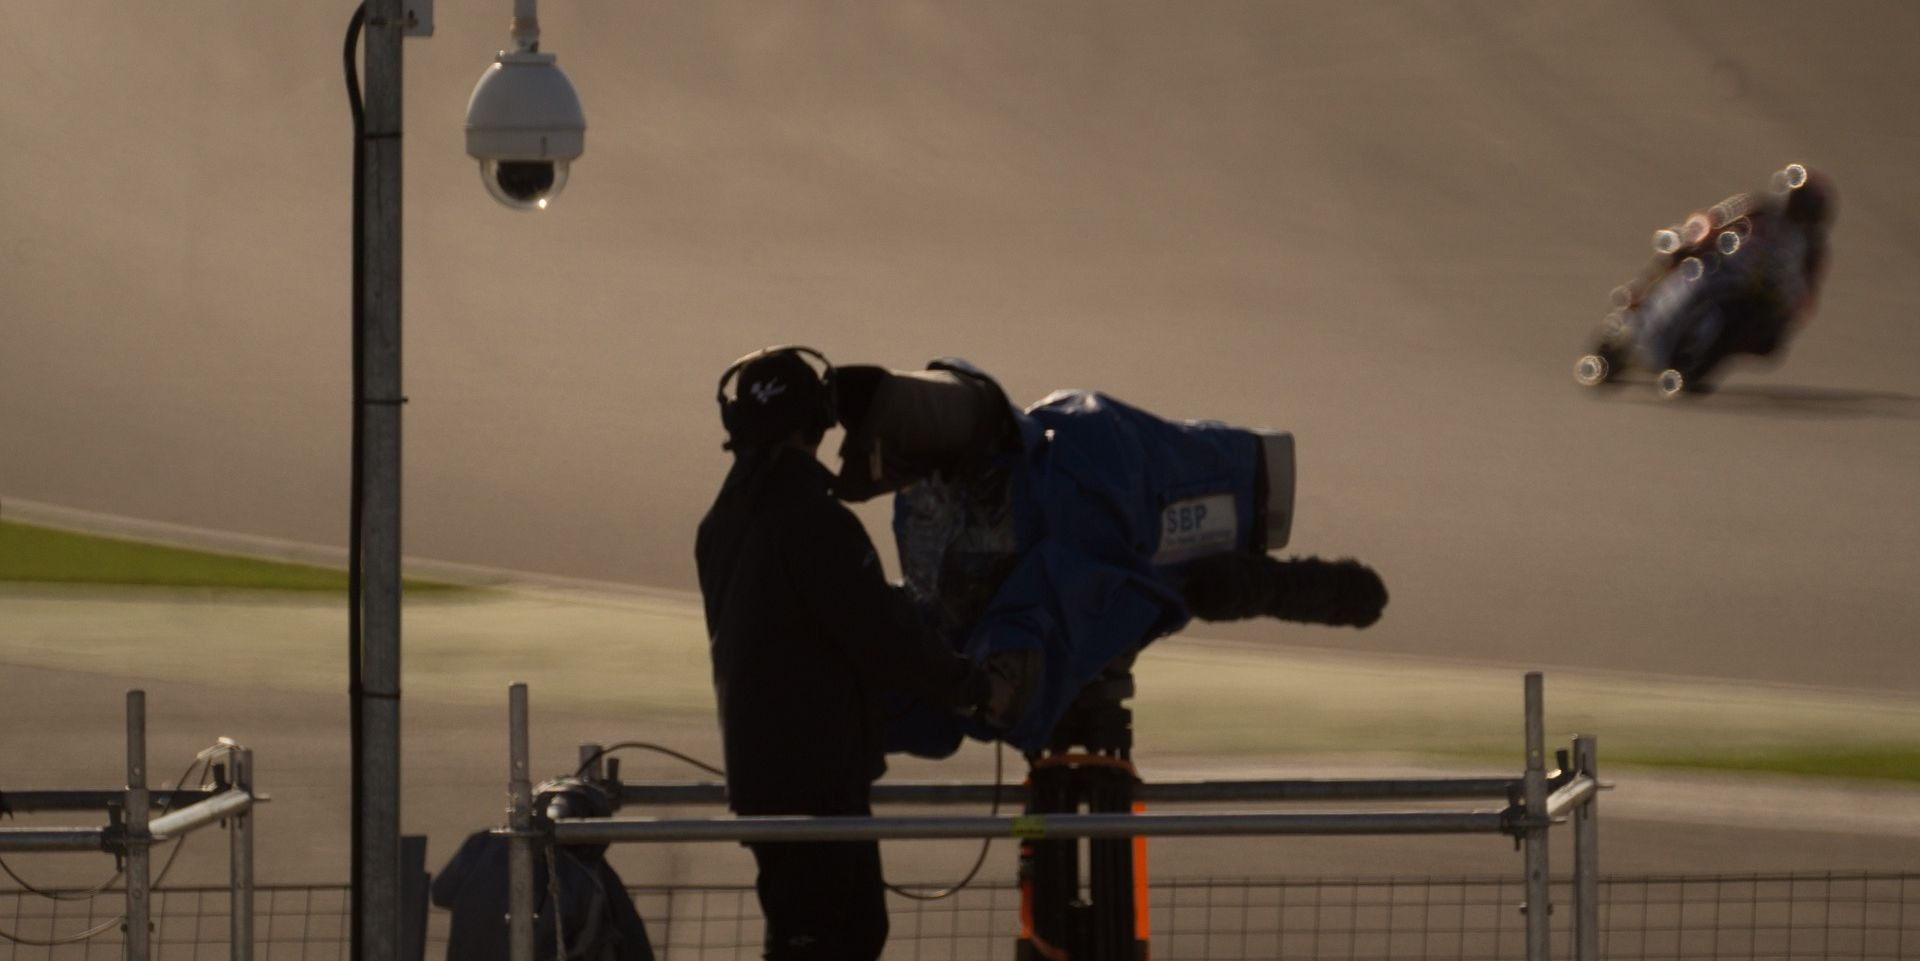 Radnik poginuo na snimanju nastavka 'Blade Runnera'